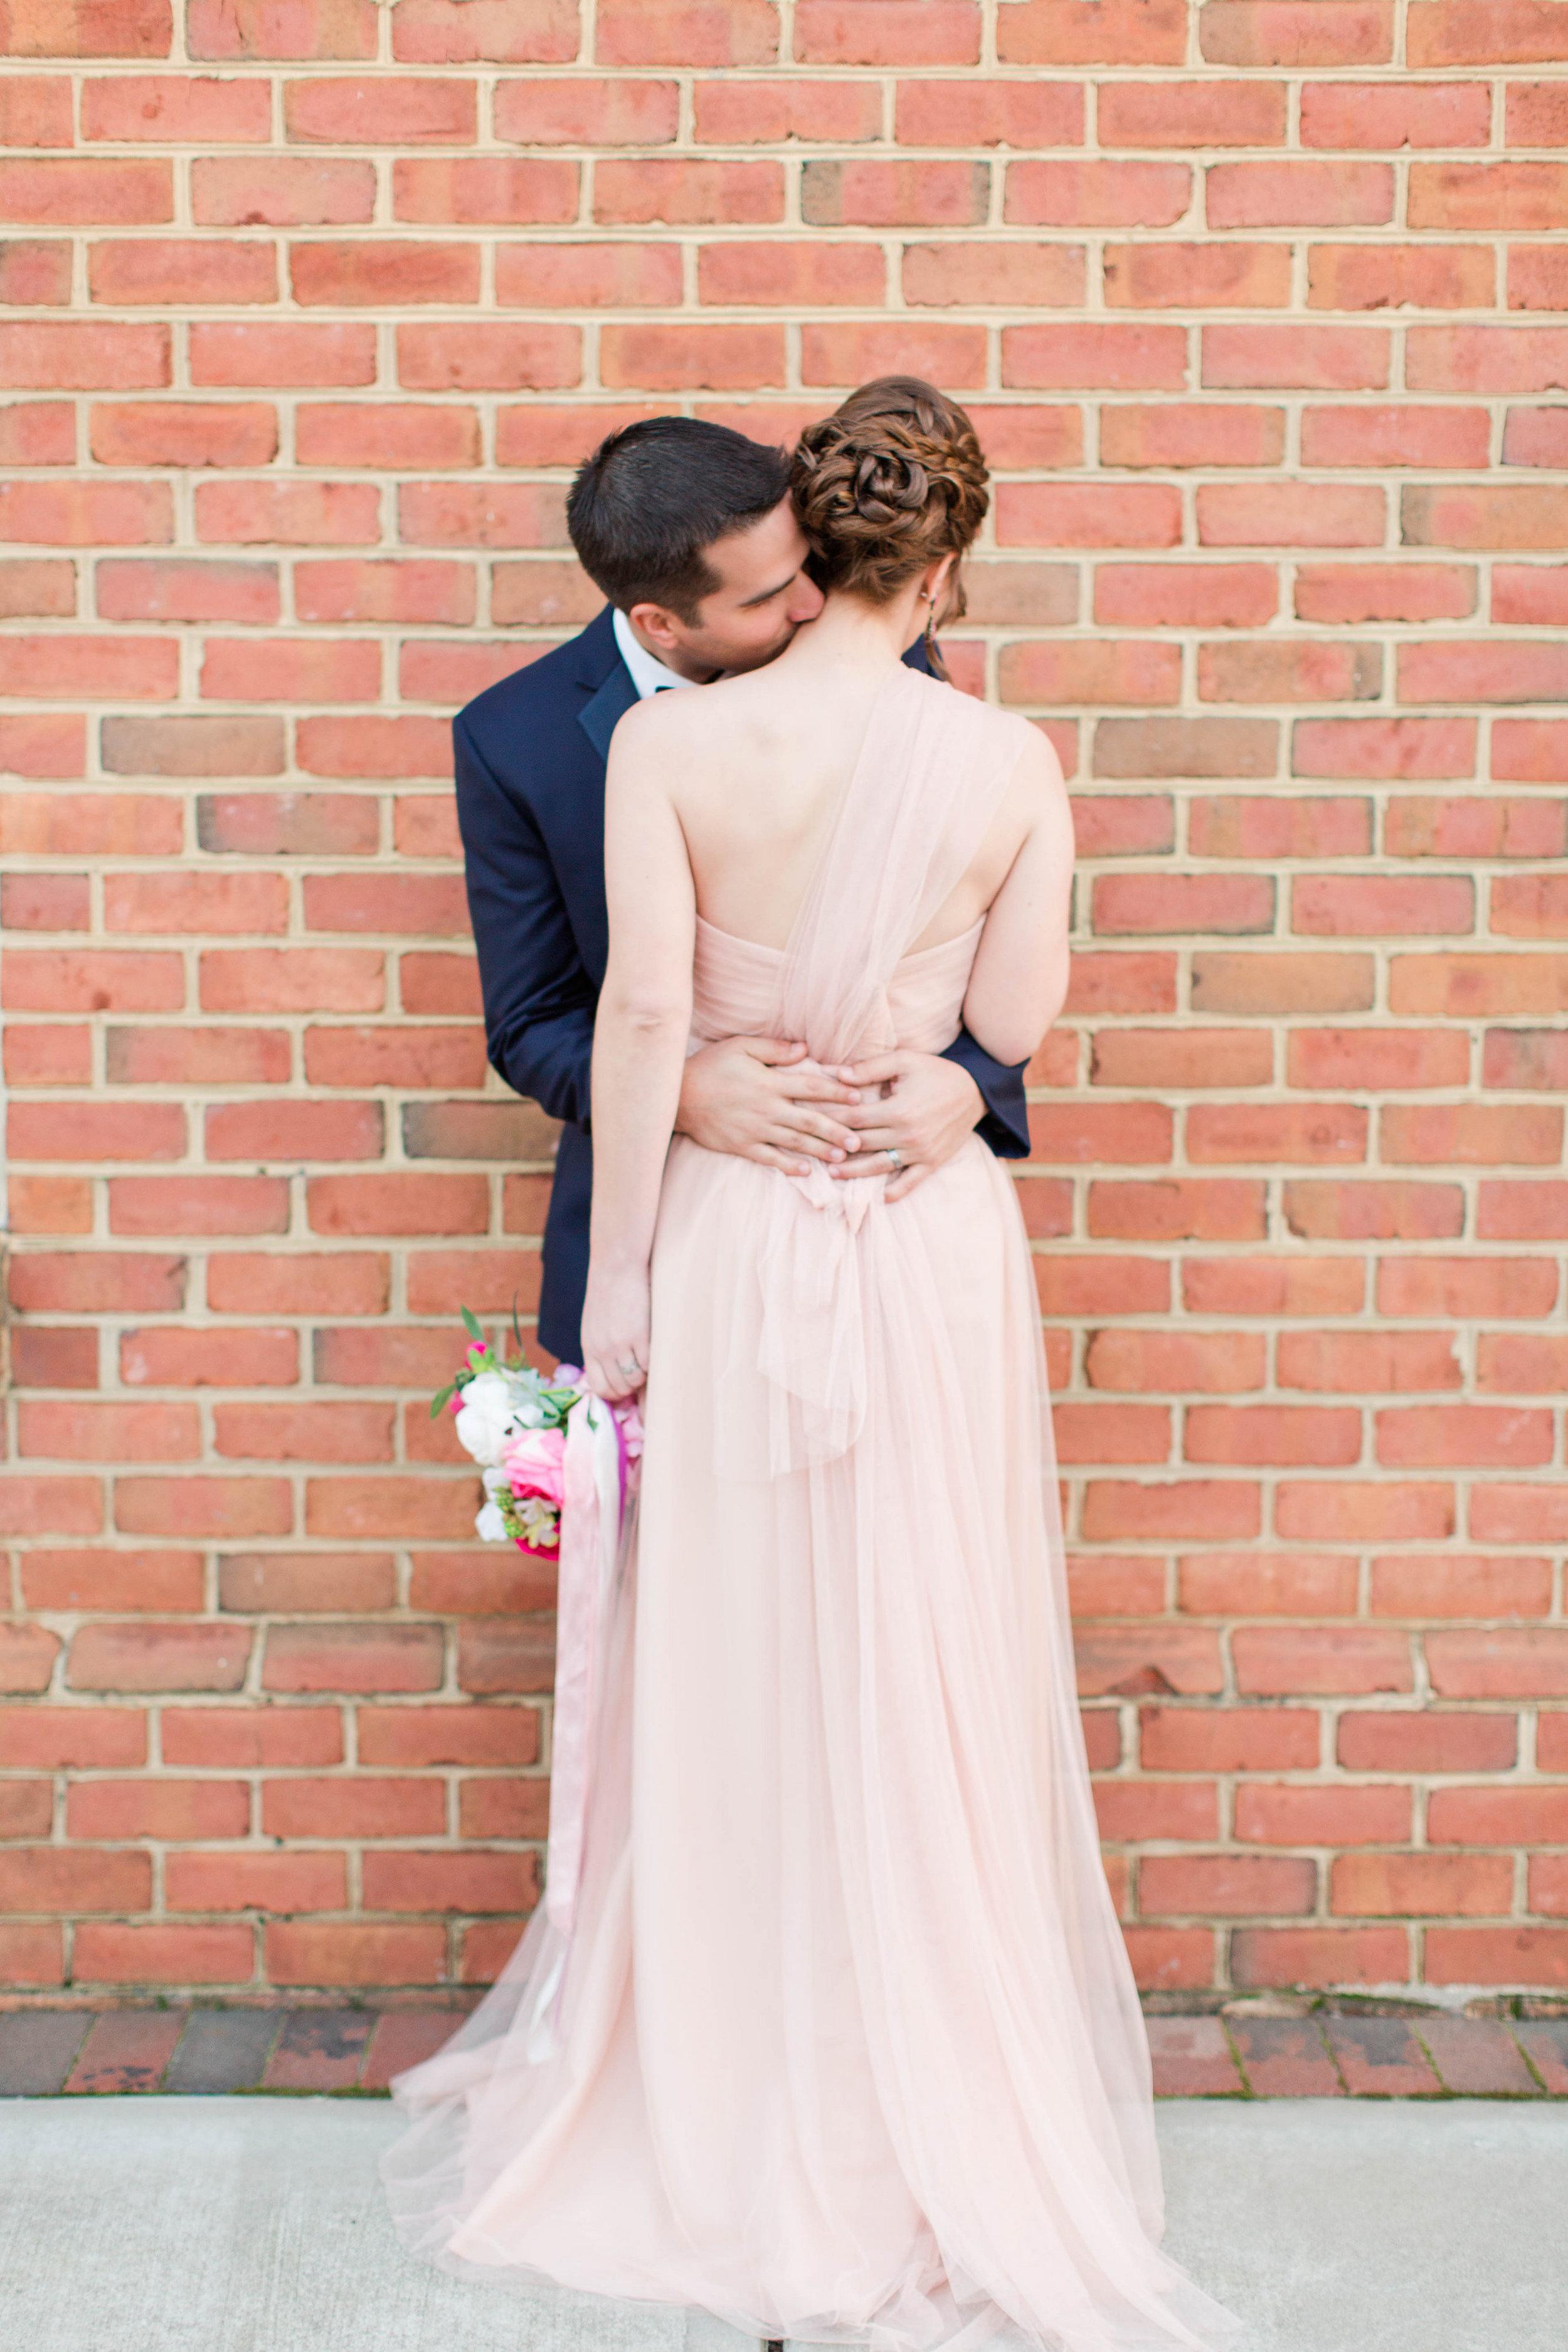 afloral-fake-flower-wedding-ivory-and-beau-bridal-boutique-maggie-sottero-saffron-the-hall-on-vine-wedding-statesboro-wedding-savannah-wedding-kristian-designs-rachel-strickland-photography-savannah-bridal-southern-bride-savannah-bride-18.jpg